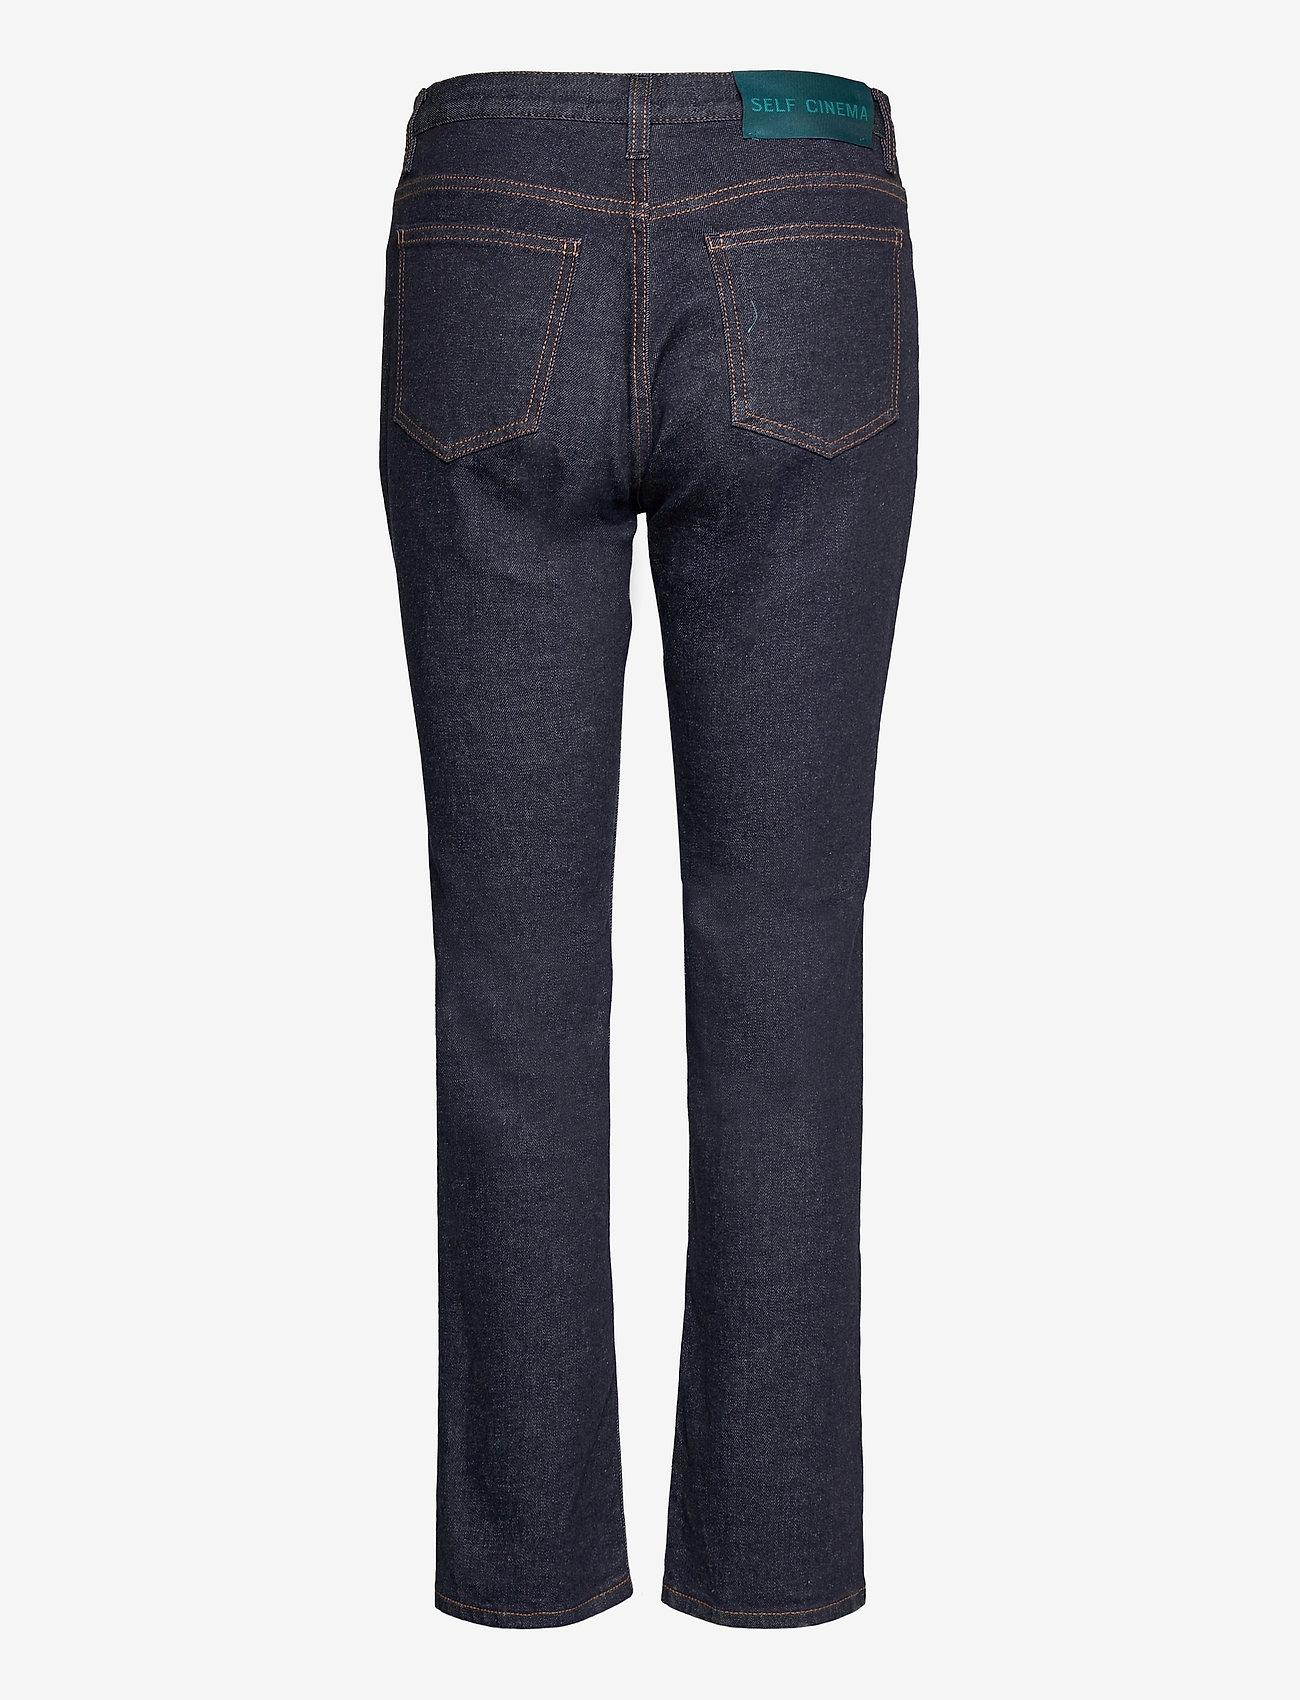 Self Cinema - Womens Slim Straight Jean - slim jeans - indigo rinse - 1